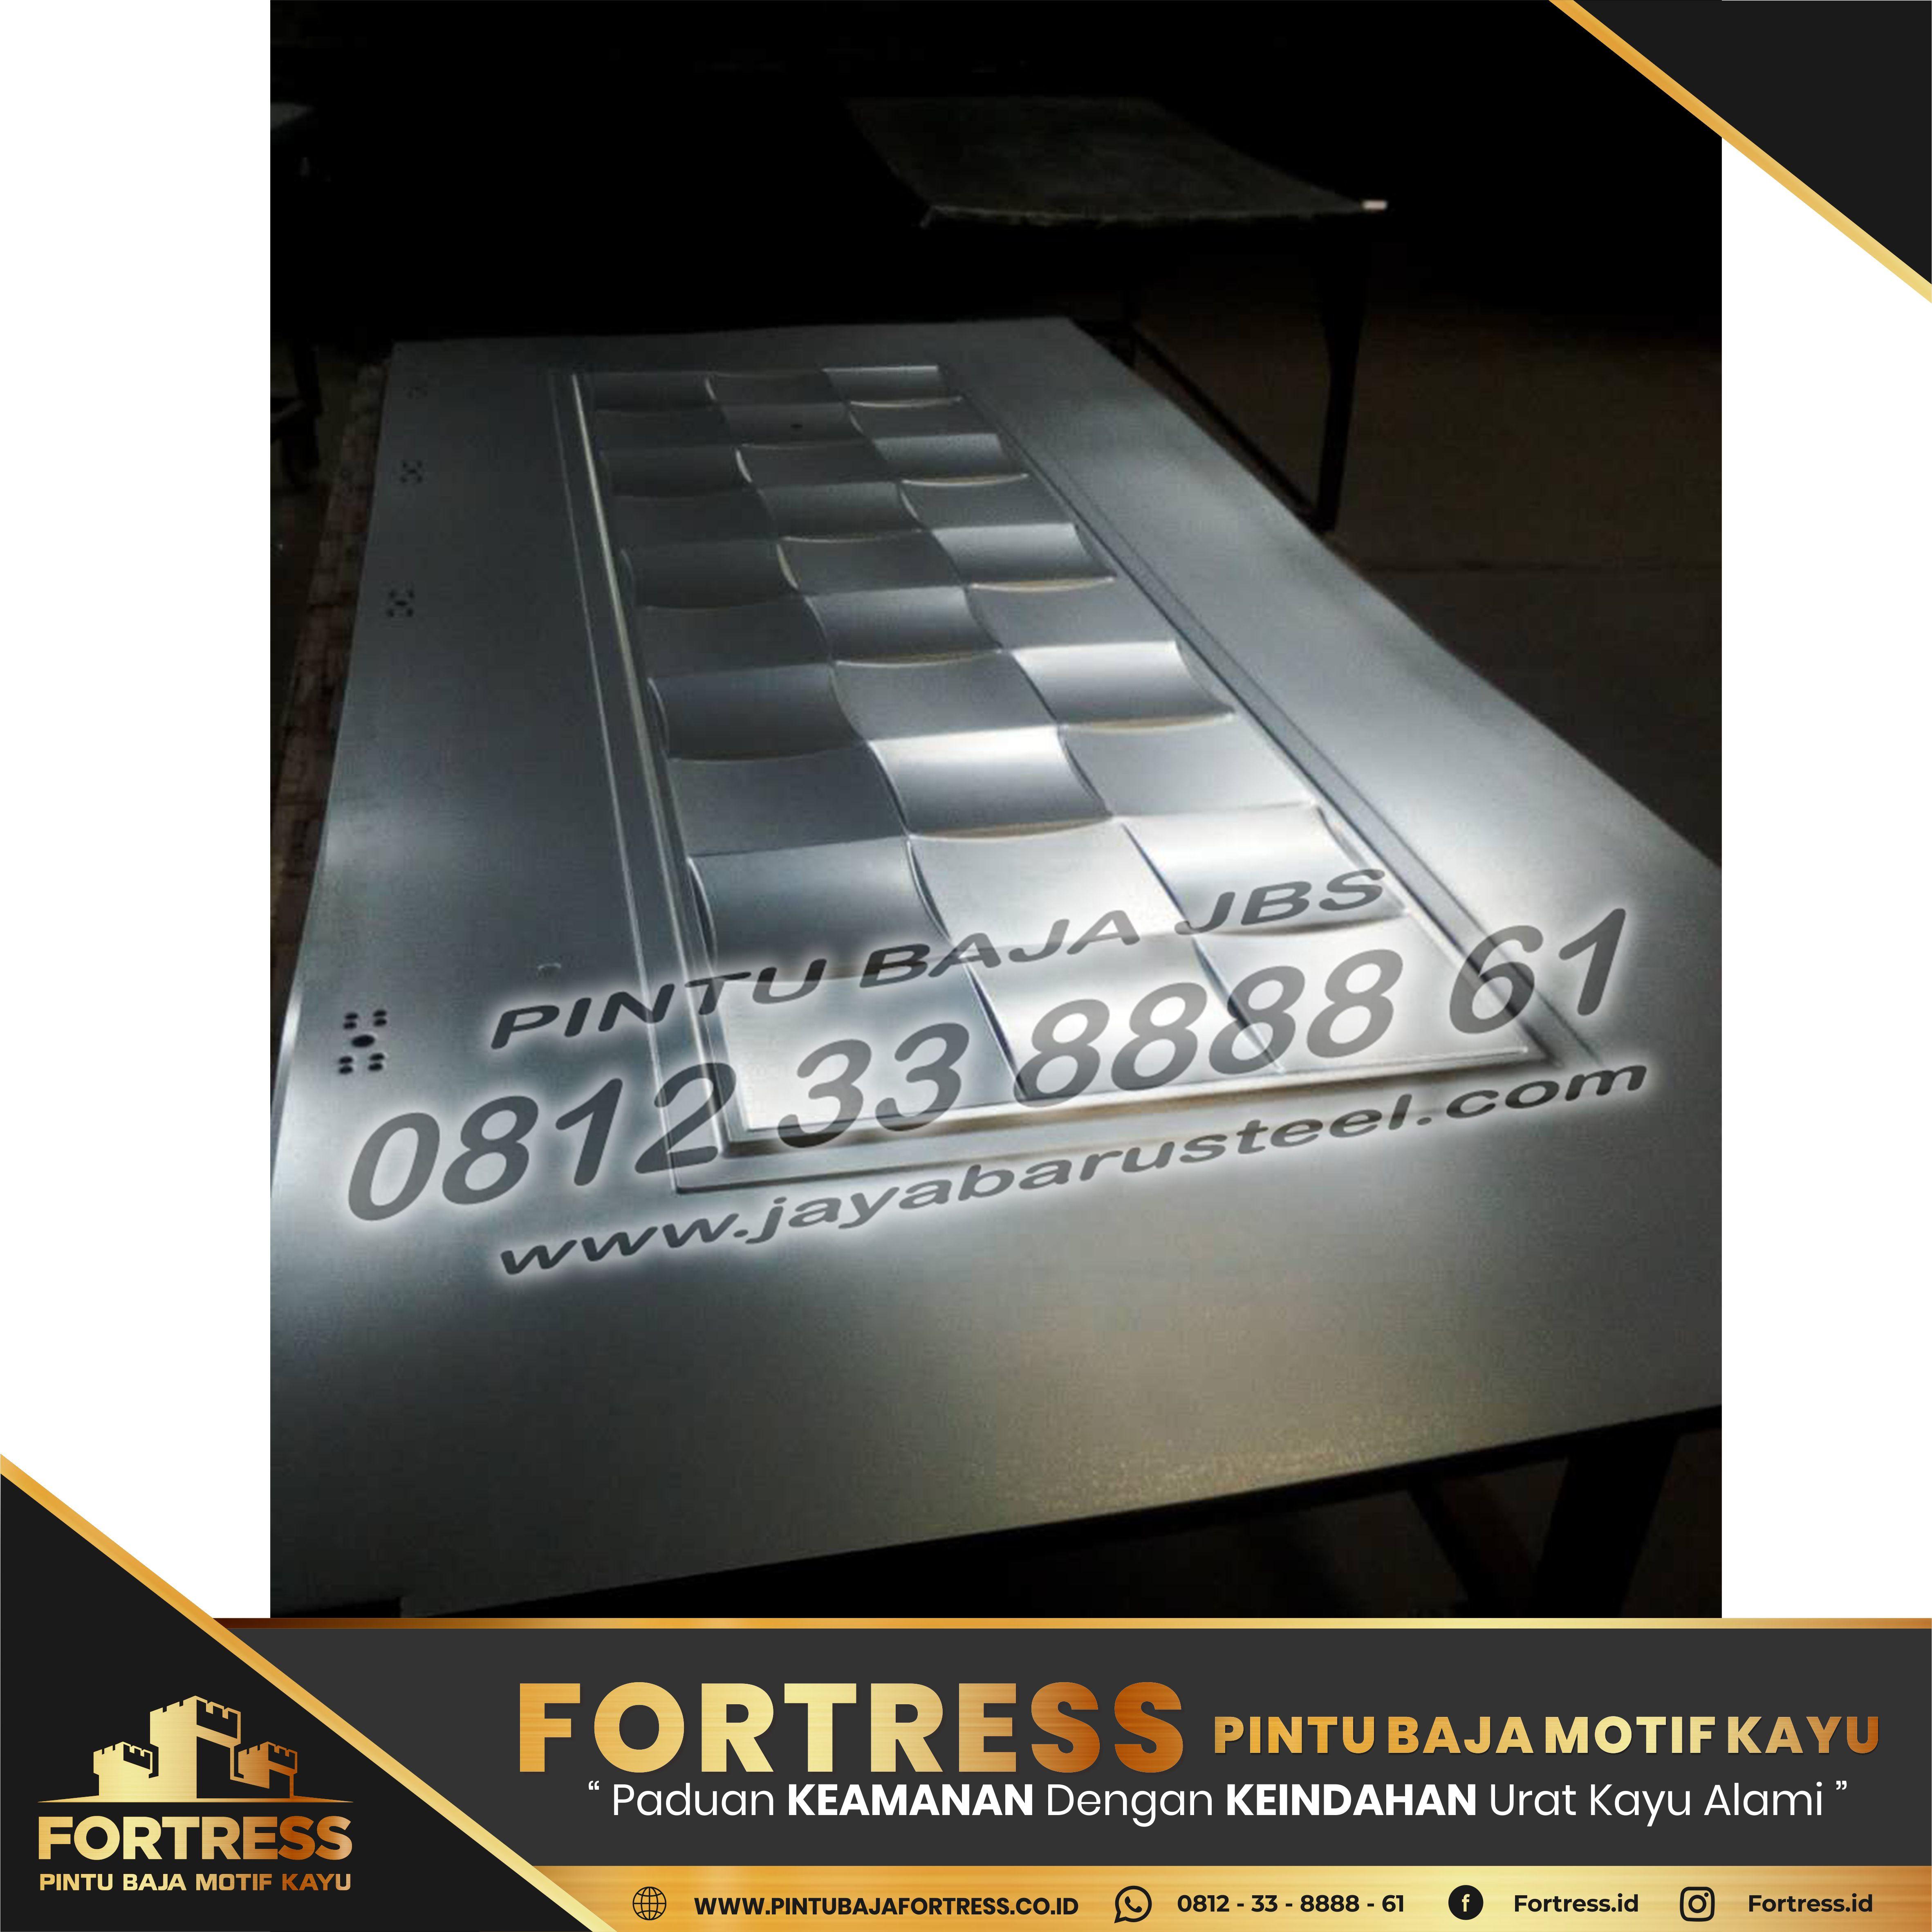 0812-91-6261-07 (FORTRESS) Manufacturer of Massive Banjar Steel Doors, …